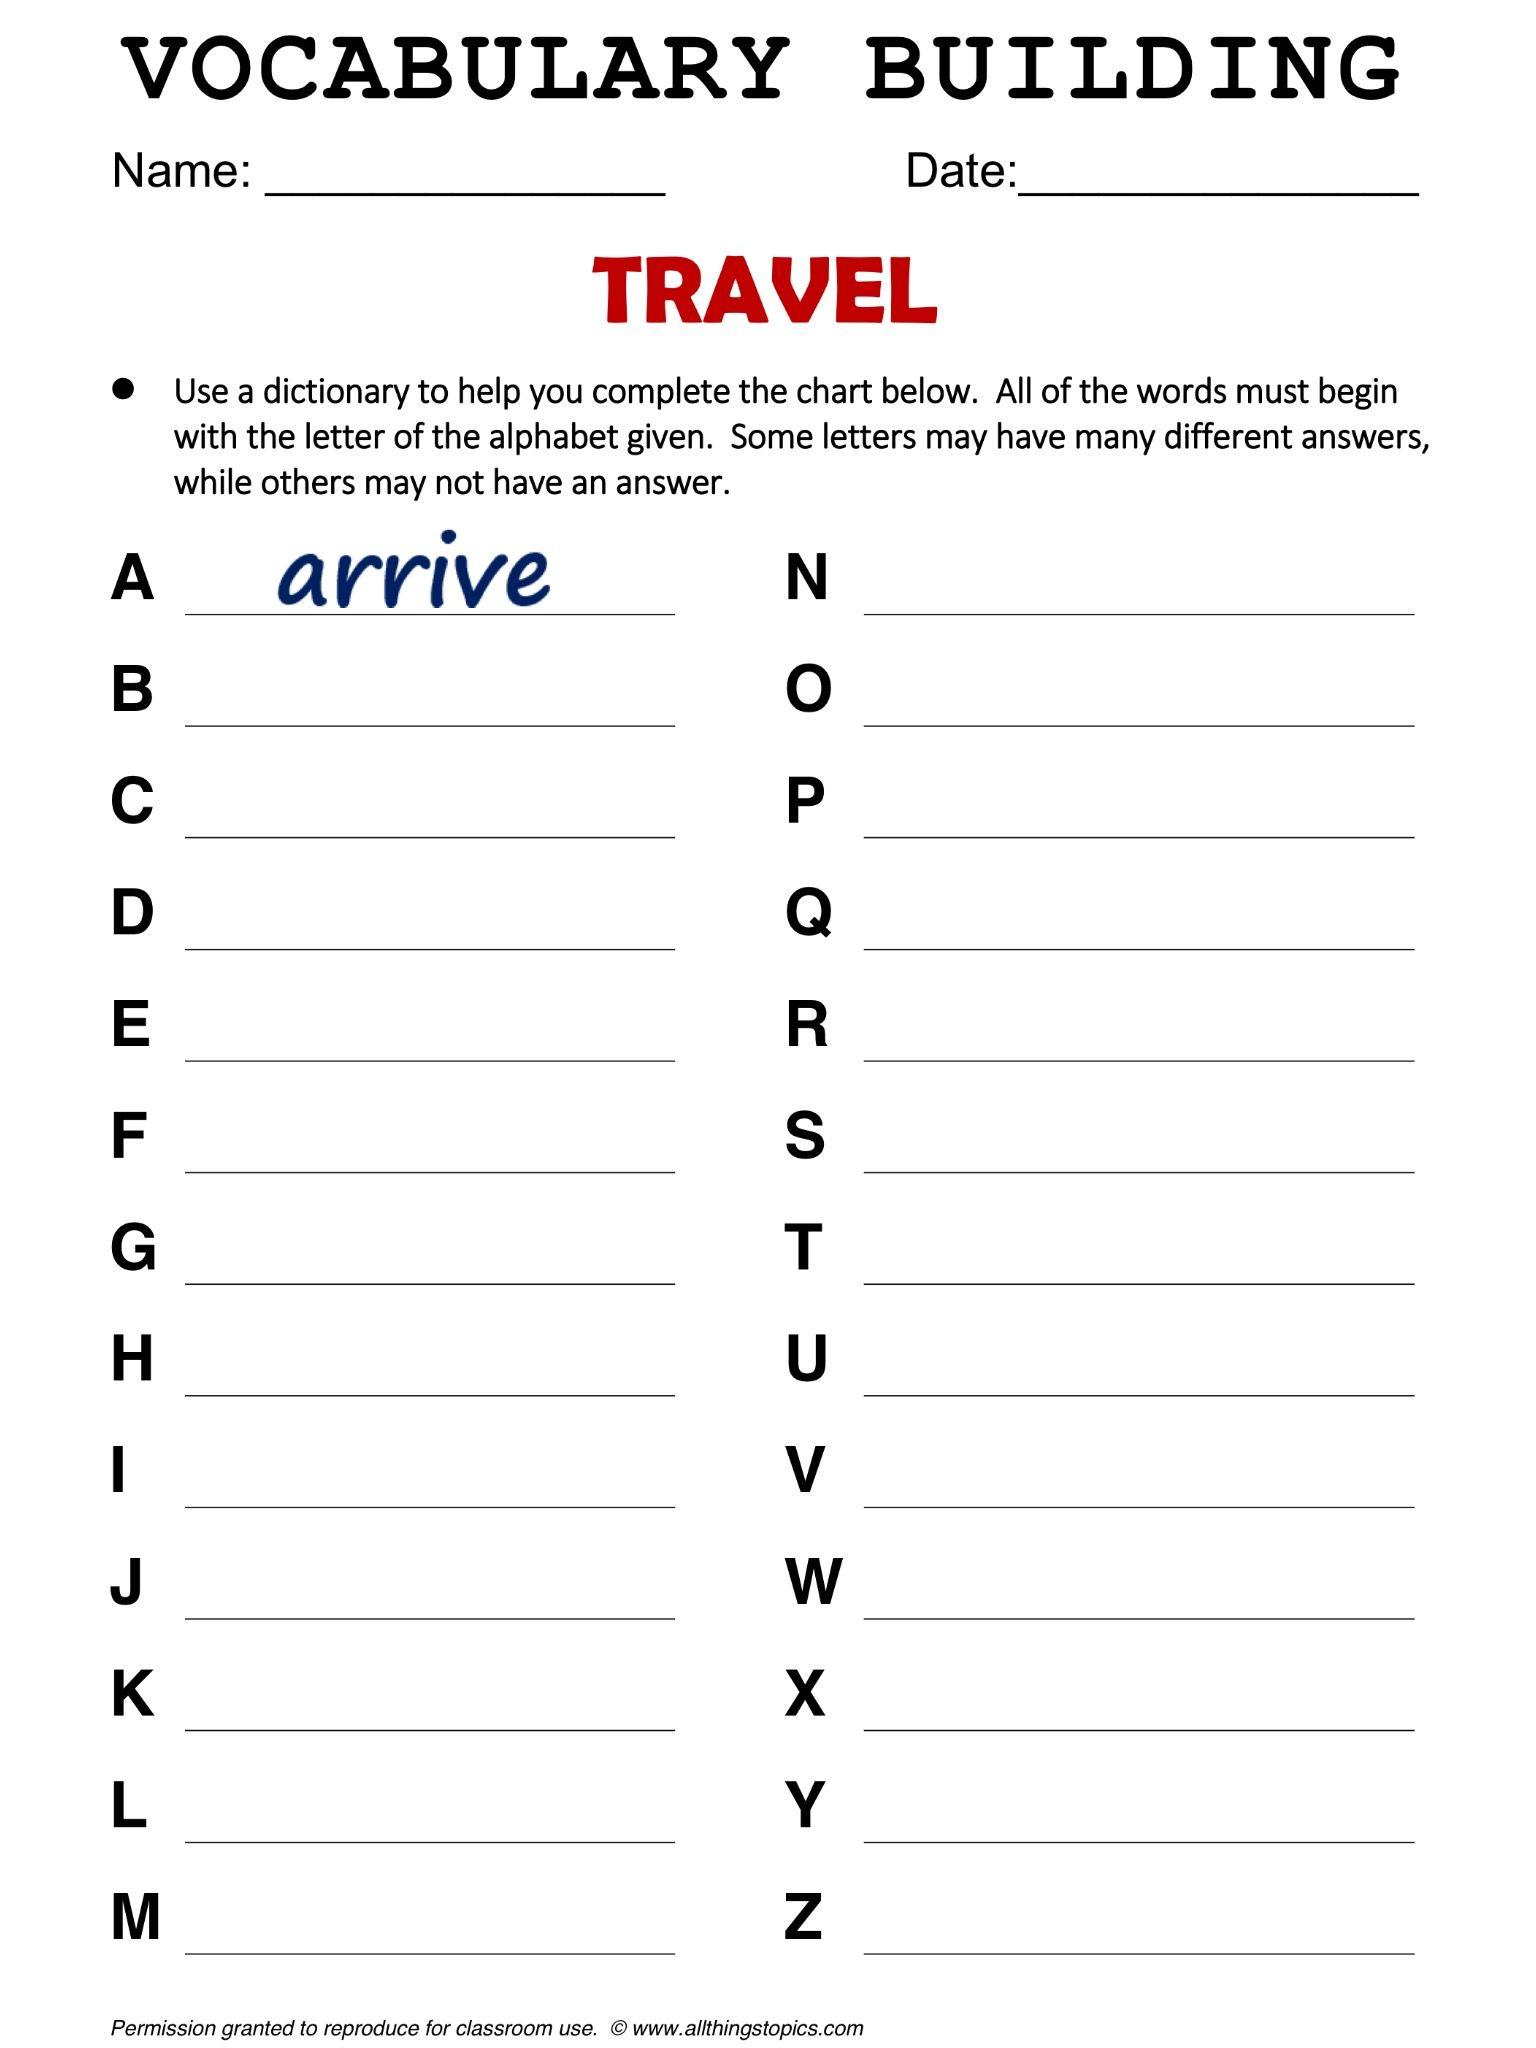 Travel English Vocabulary